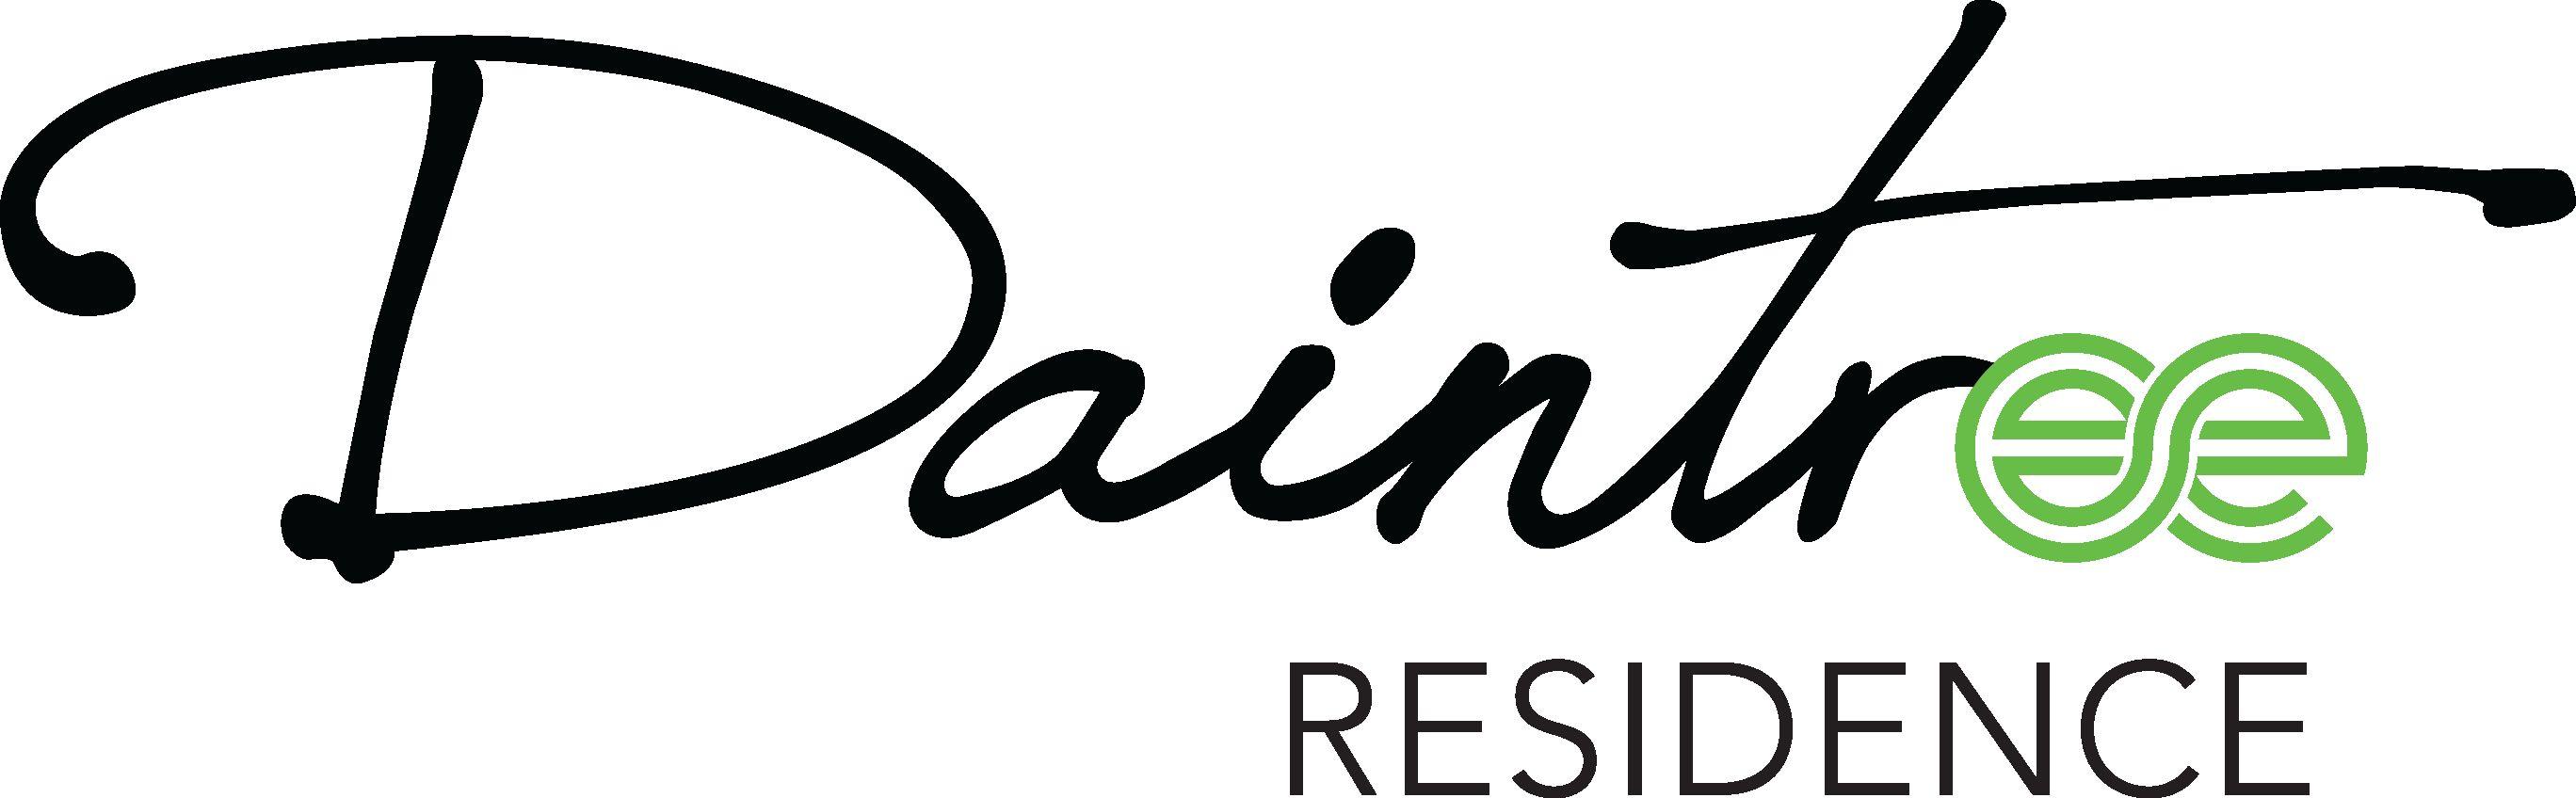 Daintree Residence logo